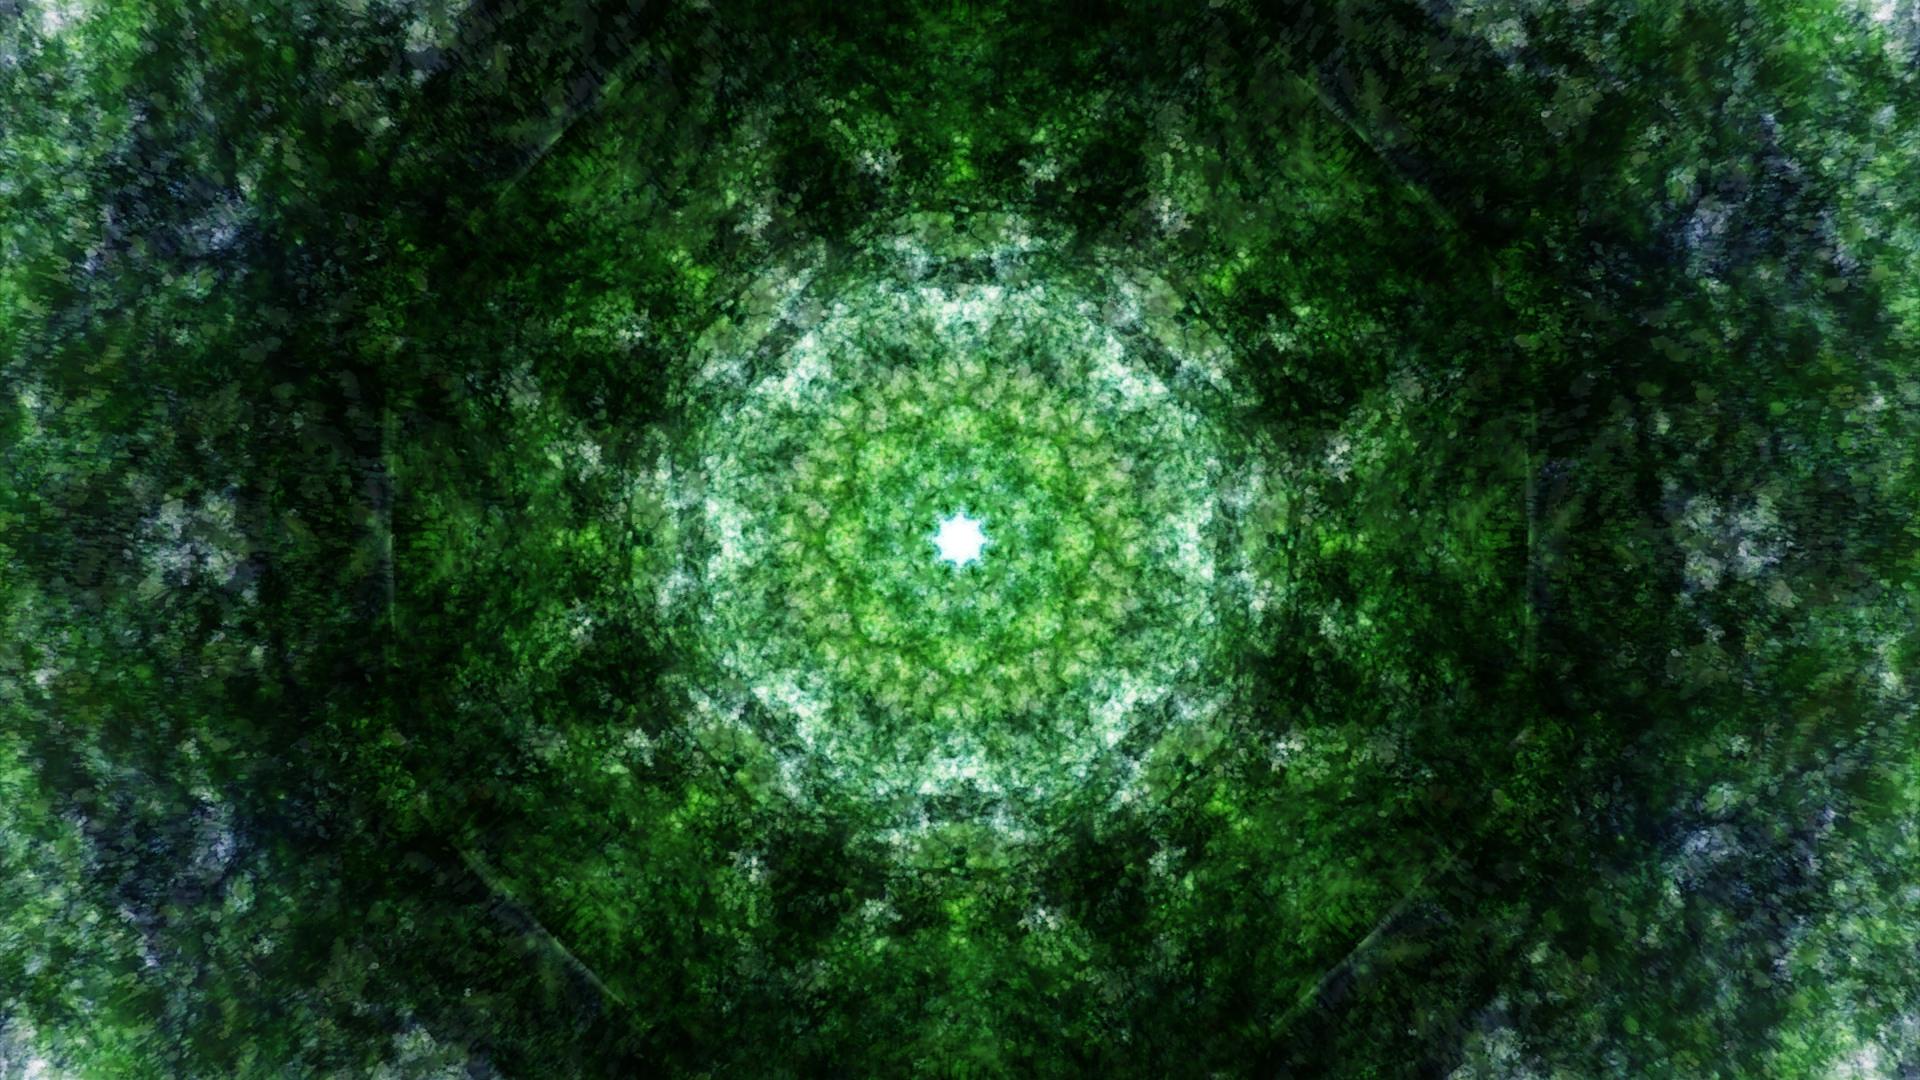 Emitting Velocity - Mohican Forest by Matt Swift Still 15